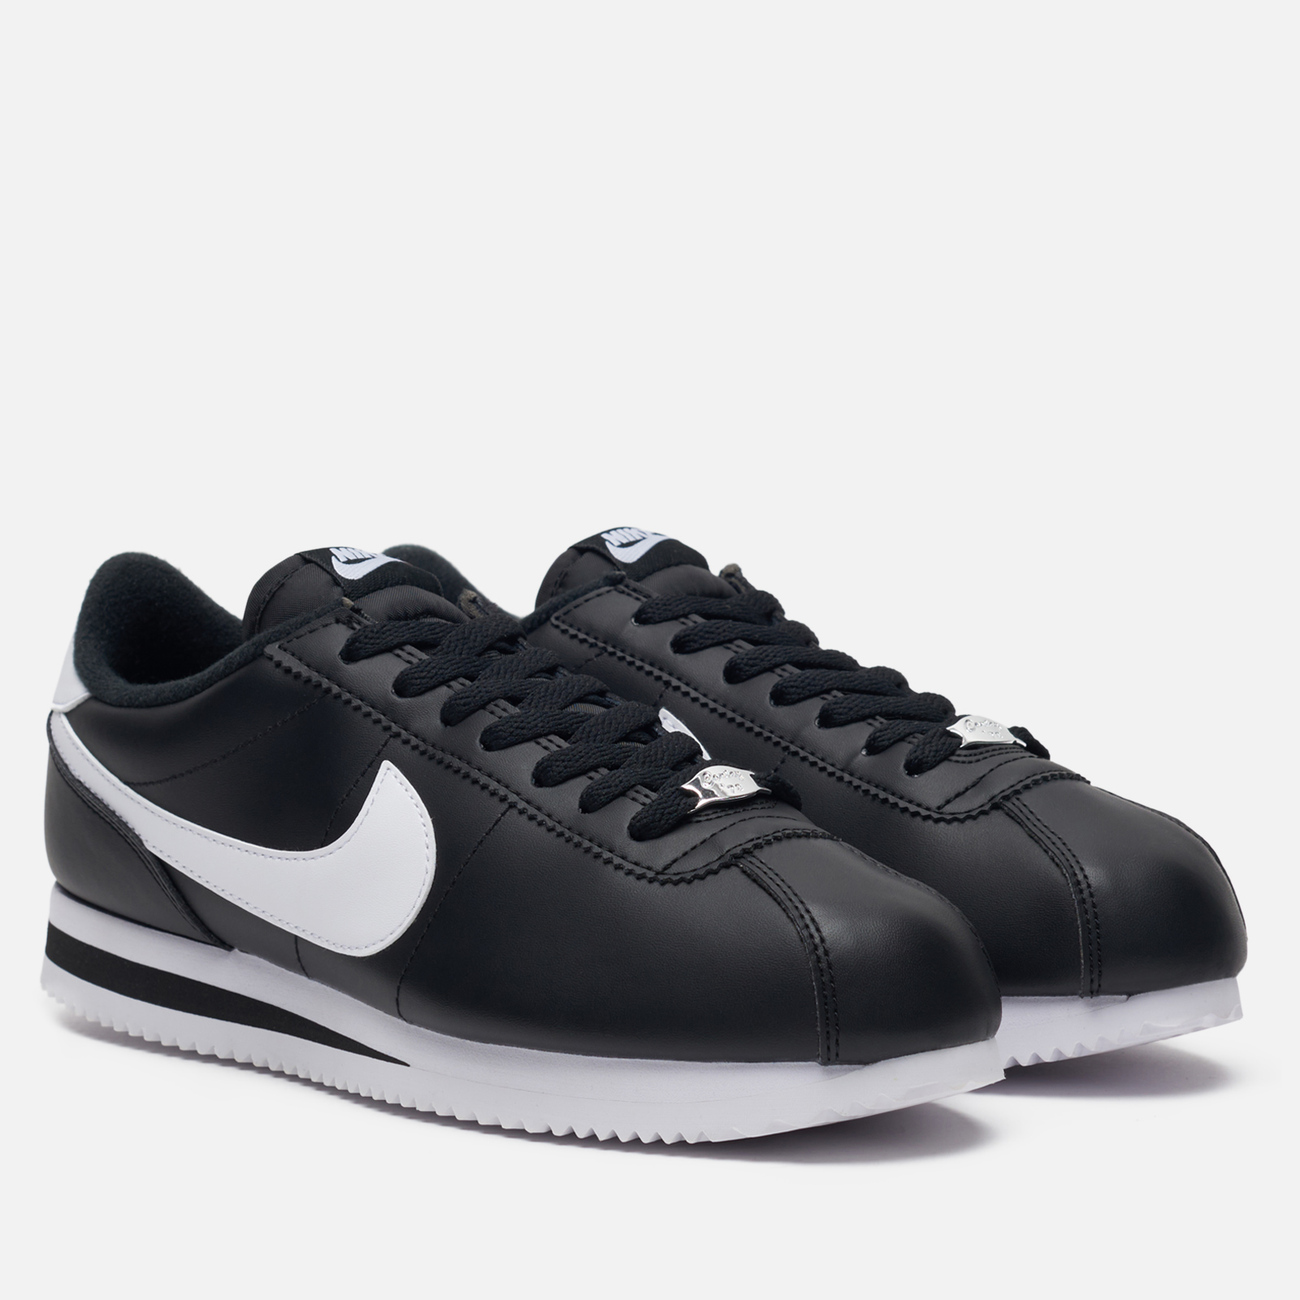 Мужские кроссовки Nike Cortez Basic Leather Black/White/Metallic Silver